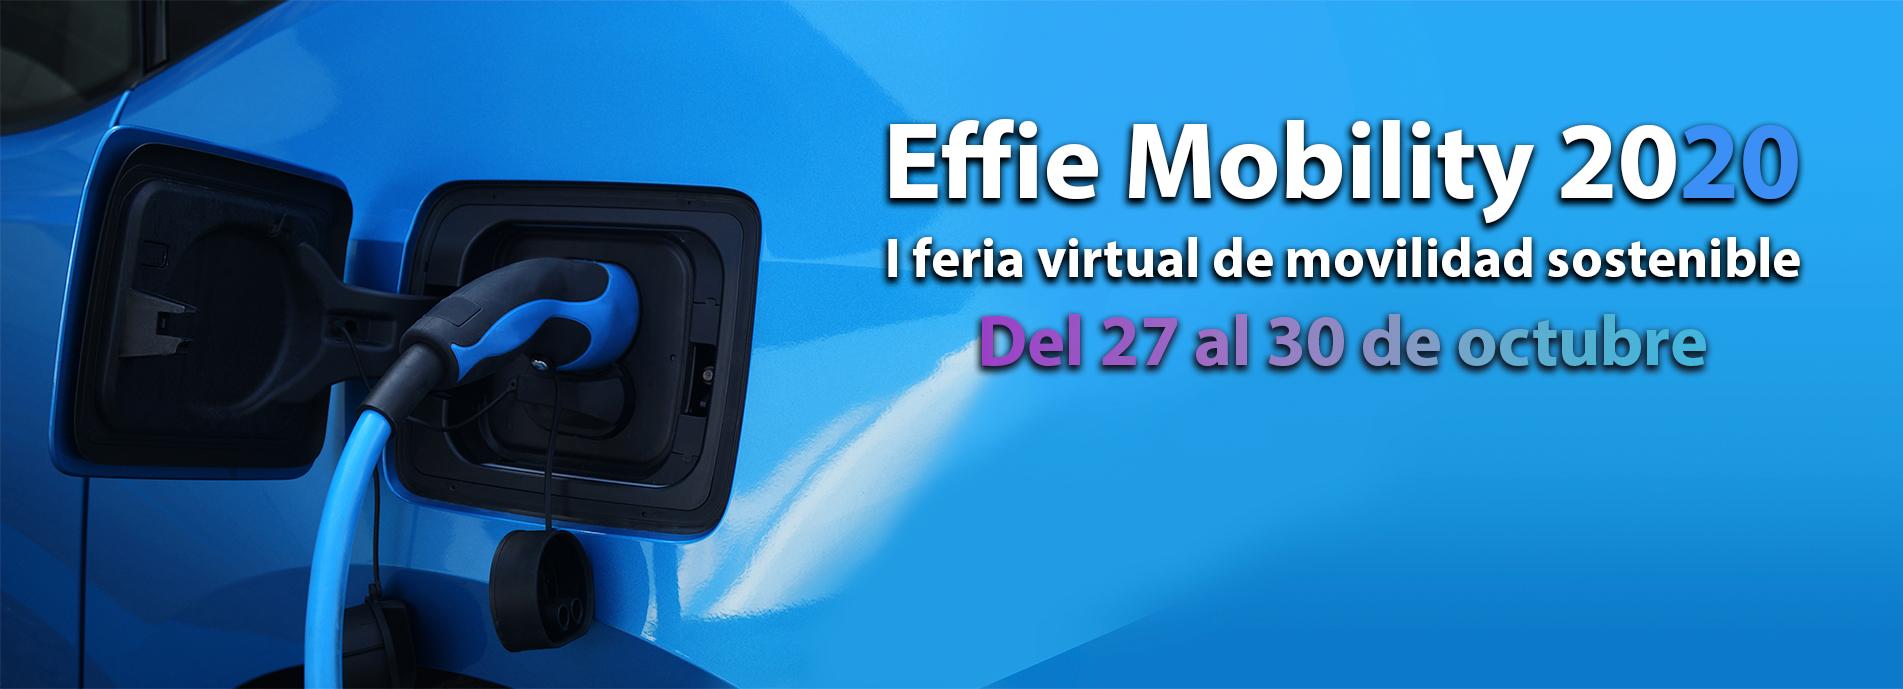 Effie Mobility 2020 - I Feria Virtual de la Mobilidad Sostenible